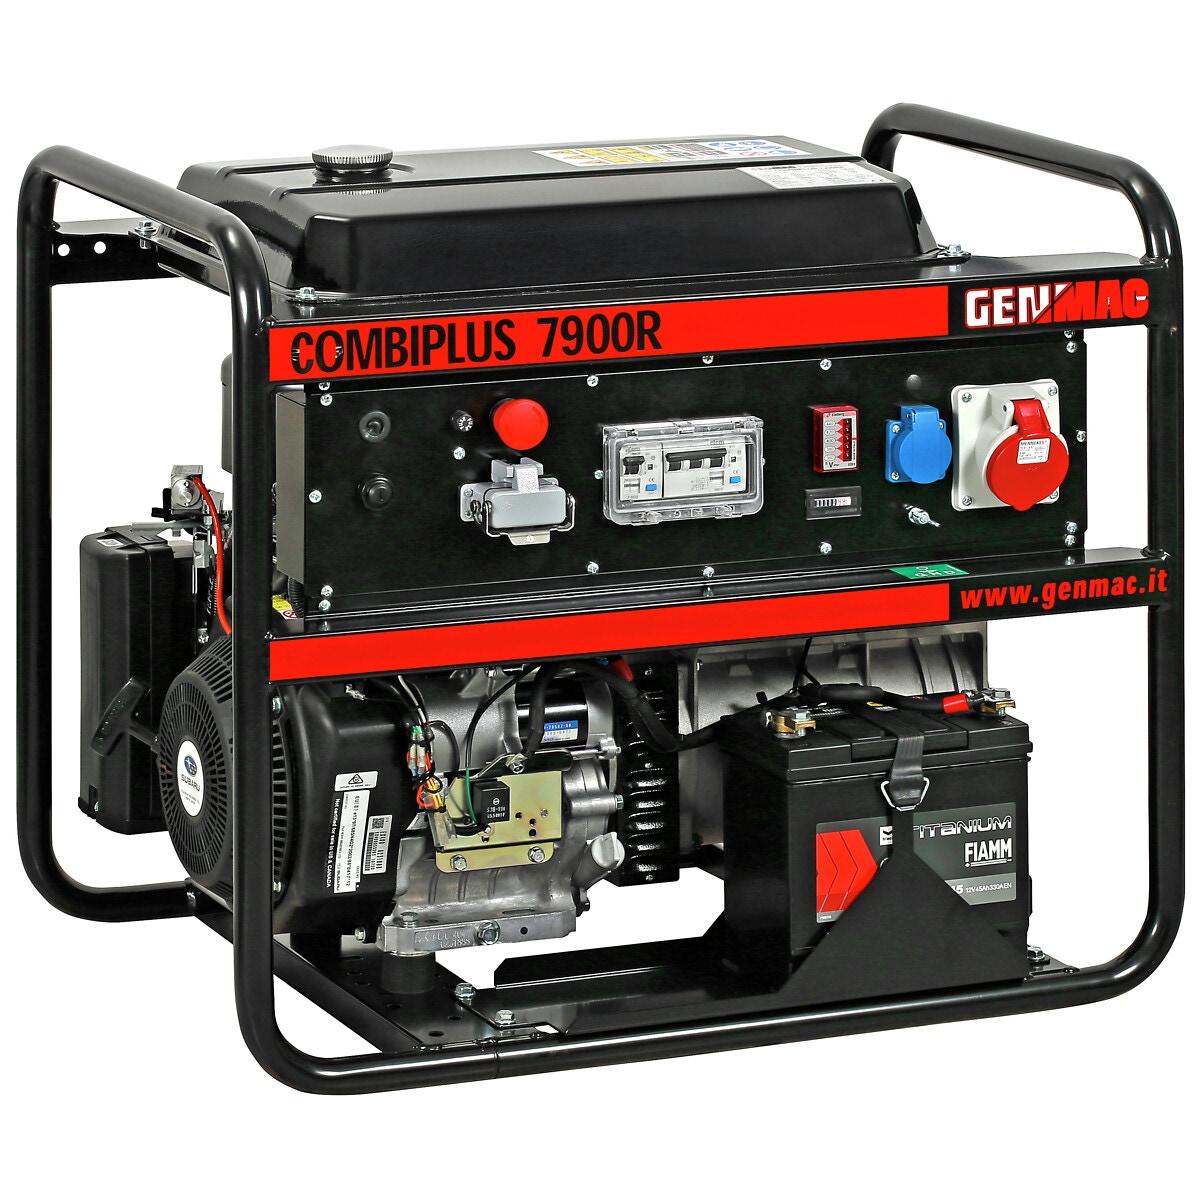 GENERATOR COMBIPLUS 59 KW 7900RE AVR PRE SETT GAS GE7900RE